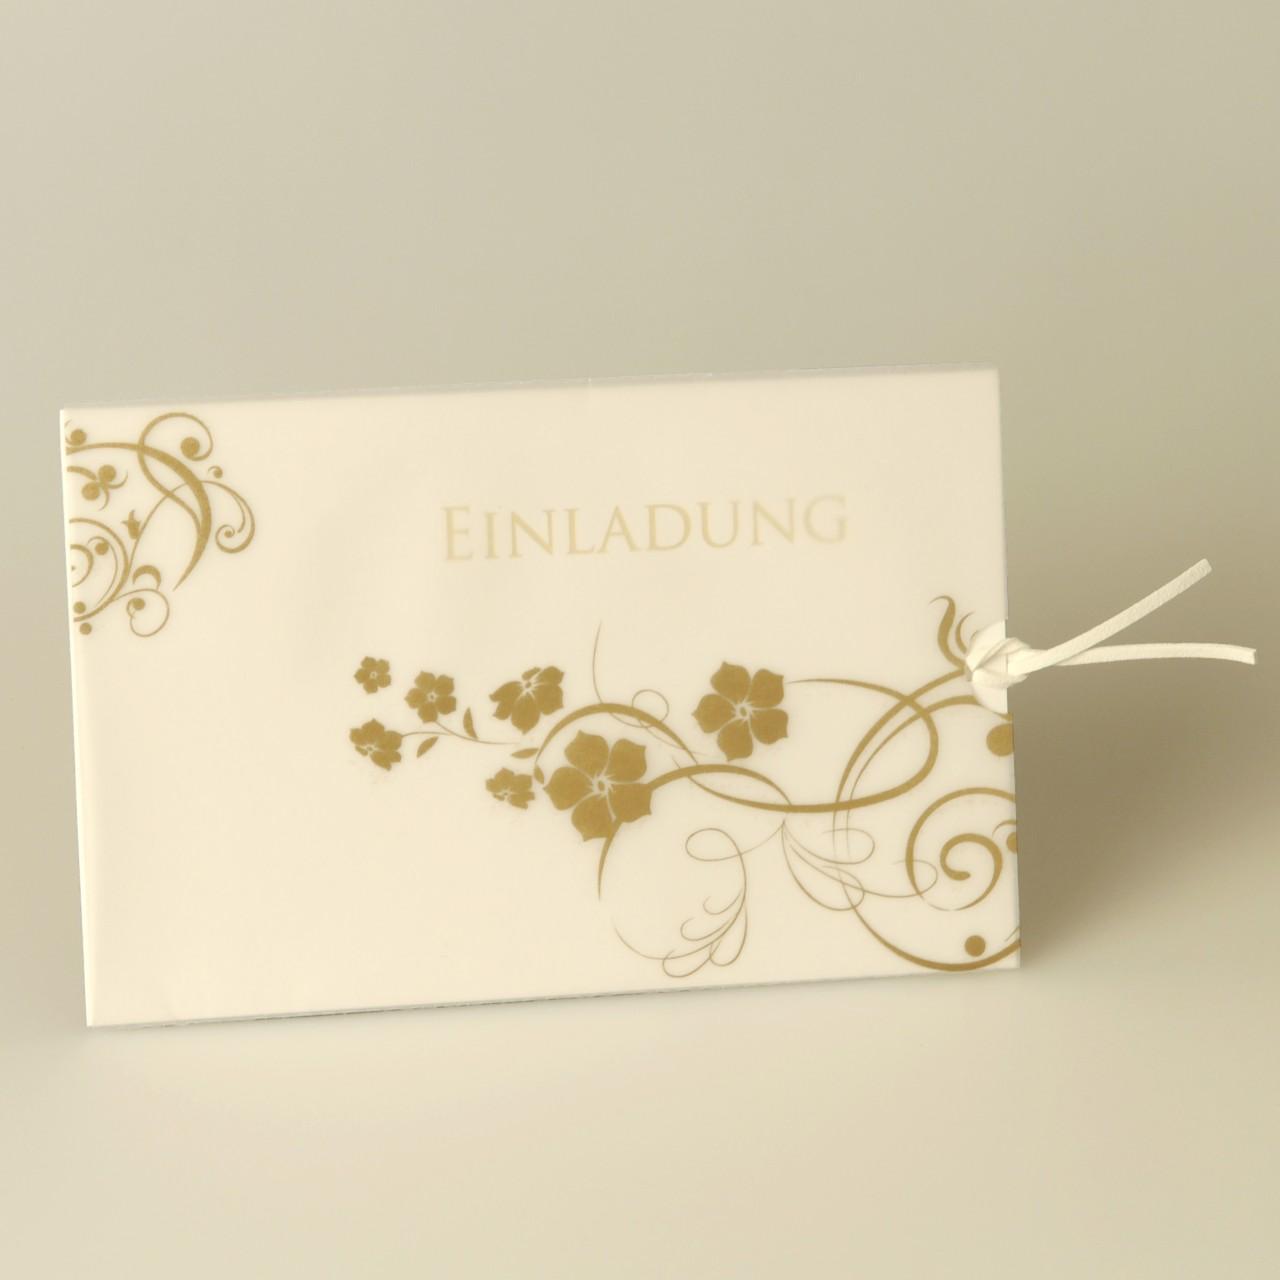 Einladungskarte - A 2000